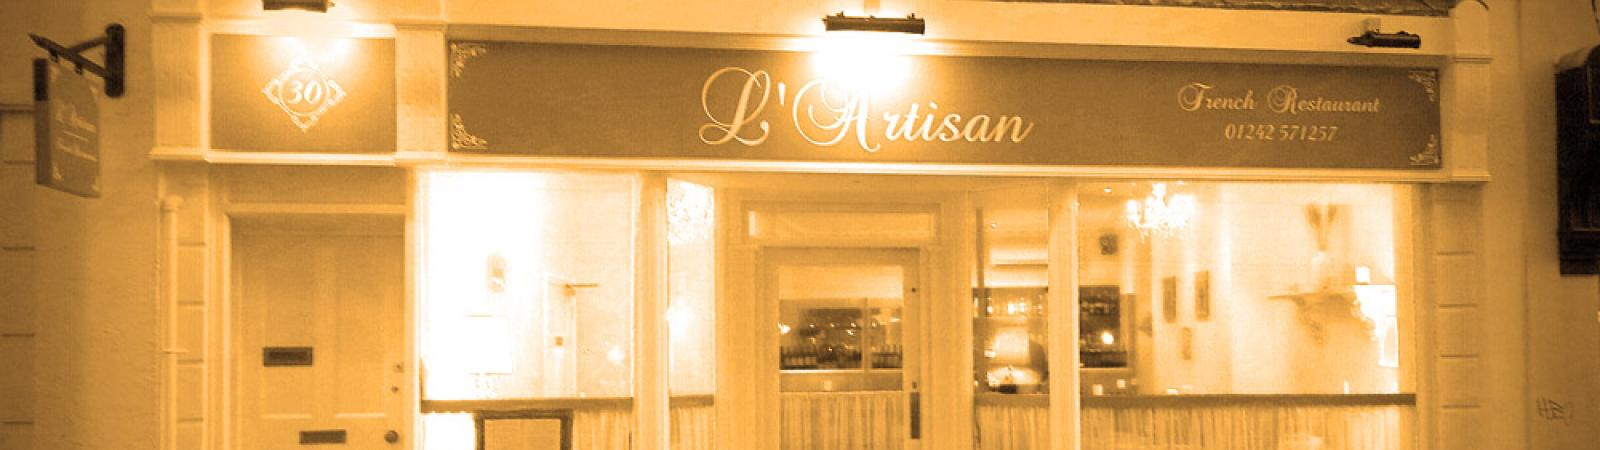 L'ARTISAN FRENCH RESTAURANT on Cheltenham Night Out | Promoting Cheltenham's nightlife for a great night out in Cheltenham.